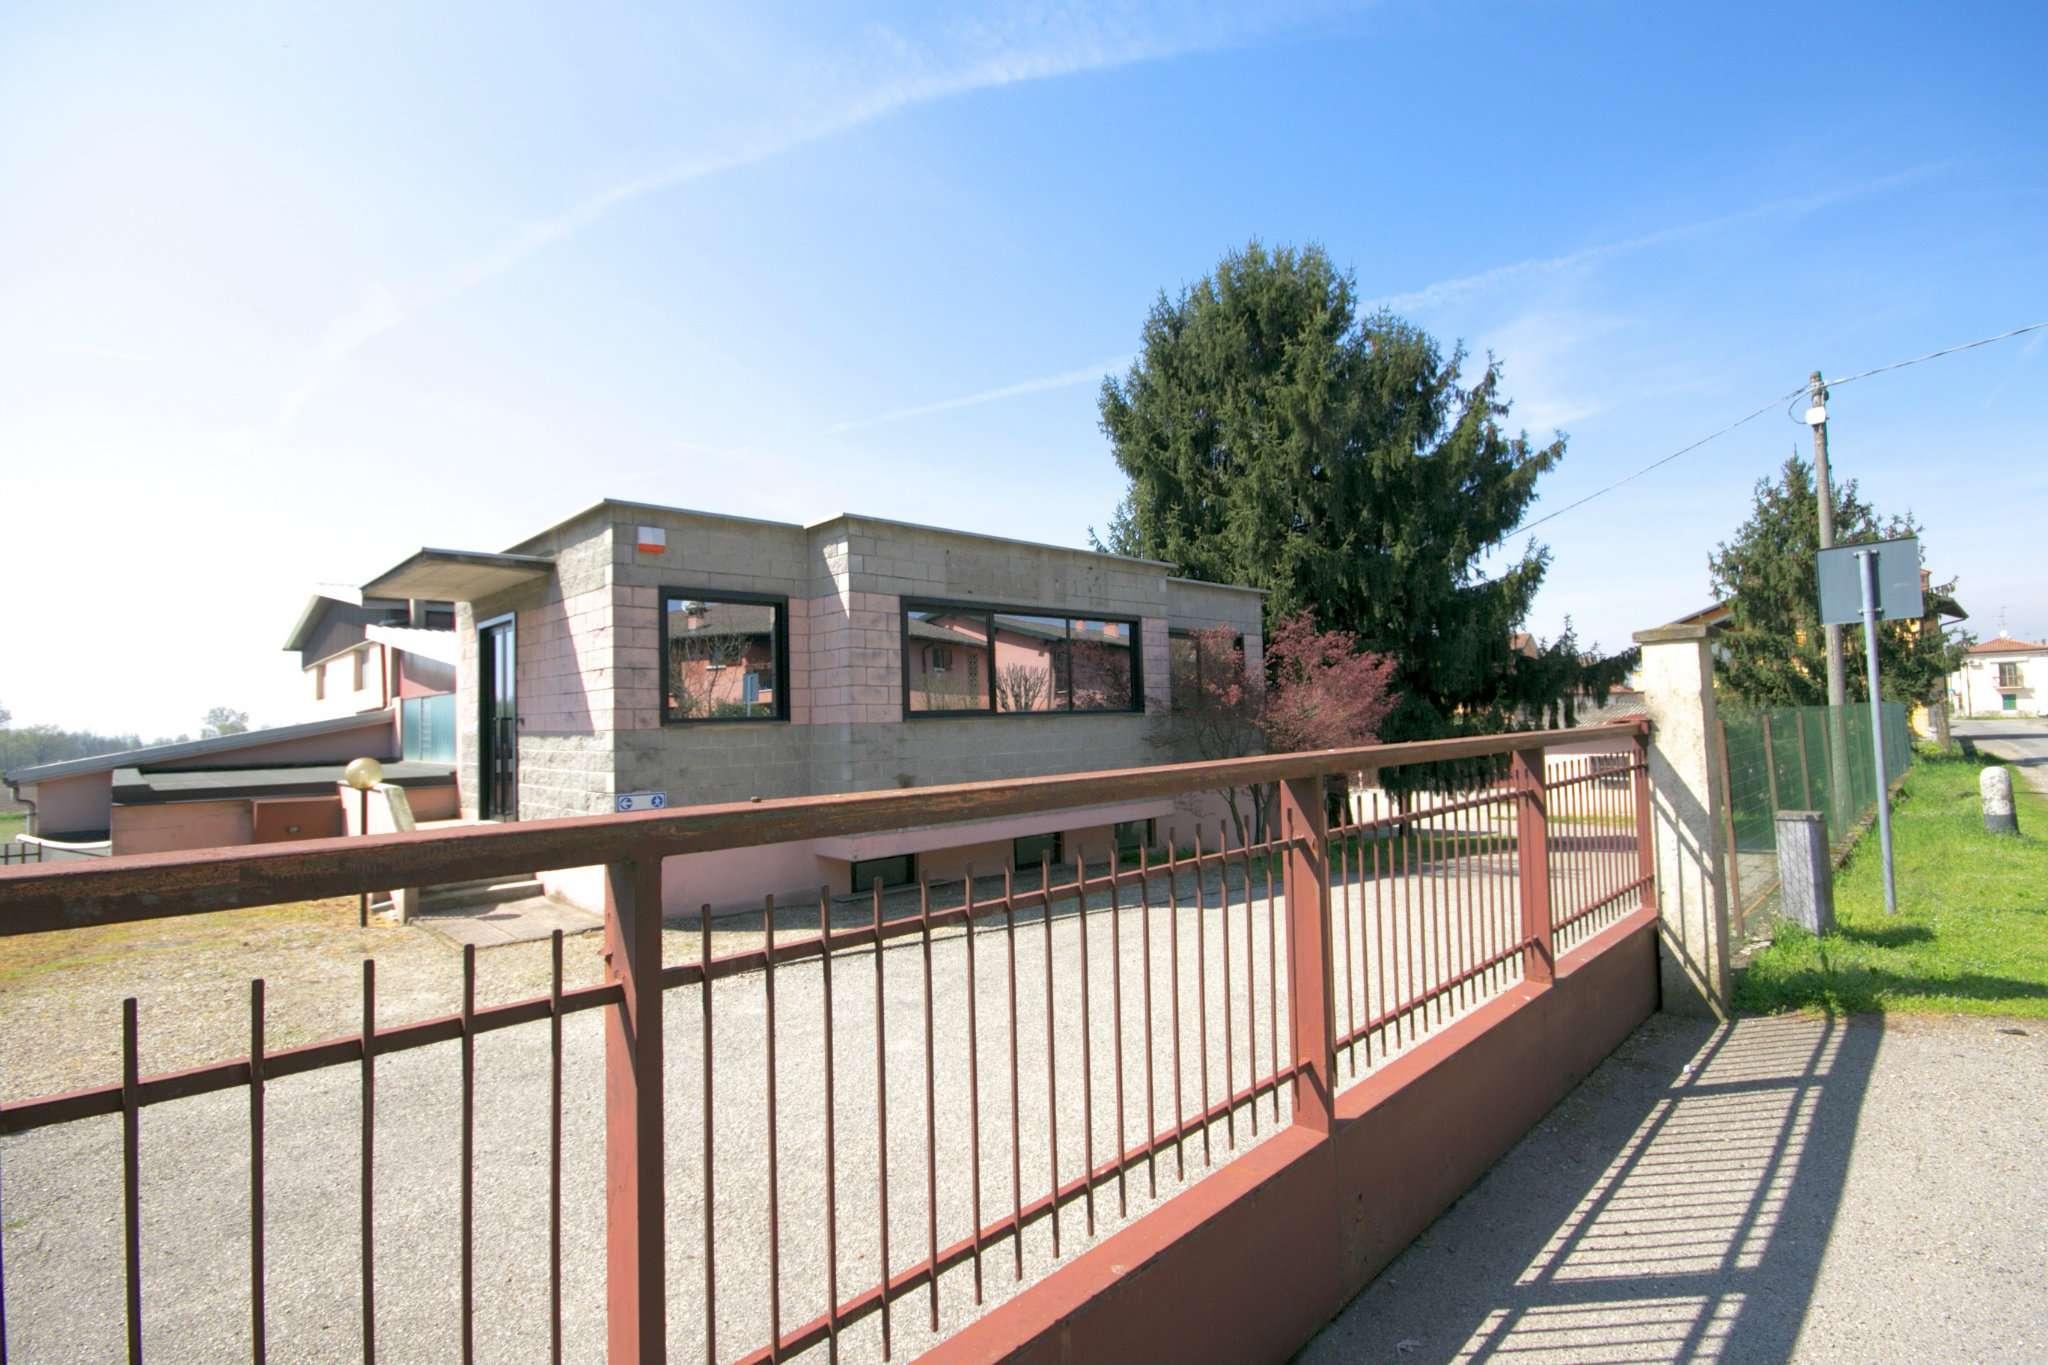 Capannone in vendita a Torre d'Isola, 9999 locali, Trattative riservate | CambioCasa.it